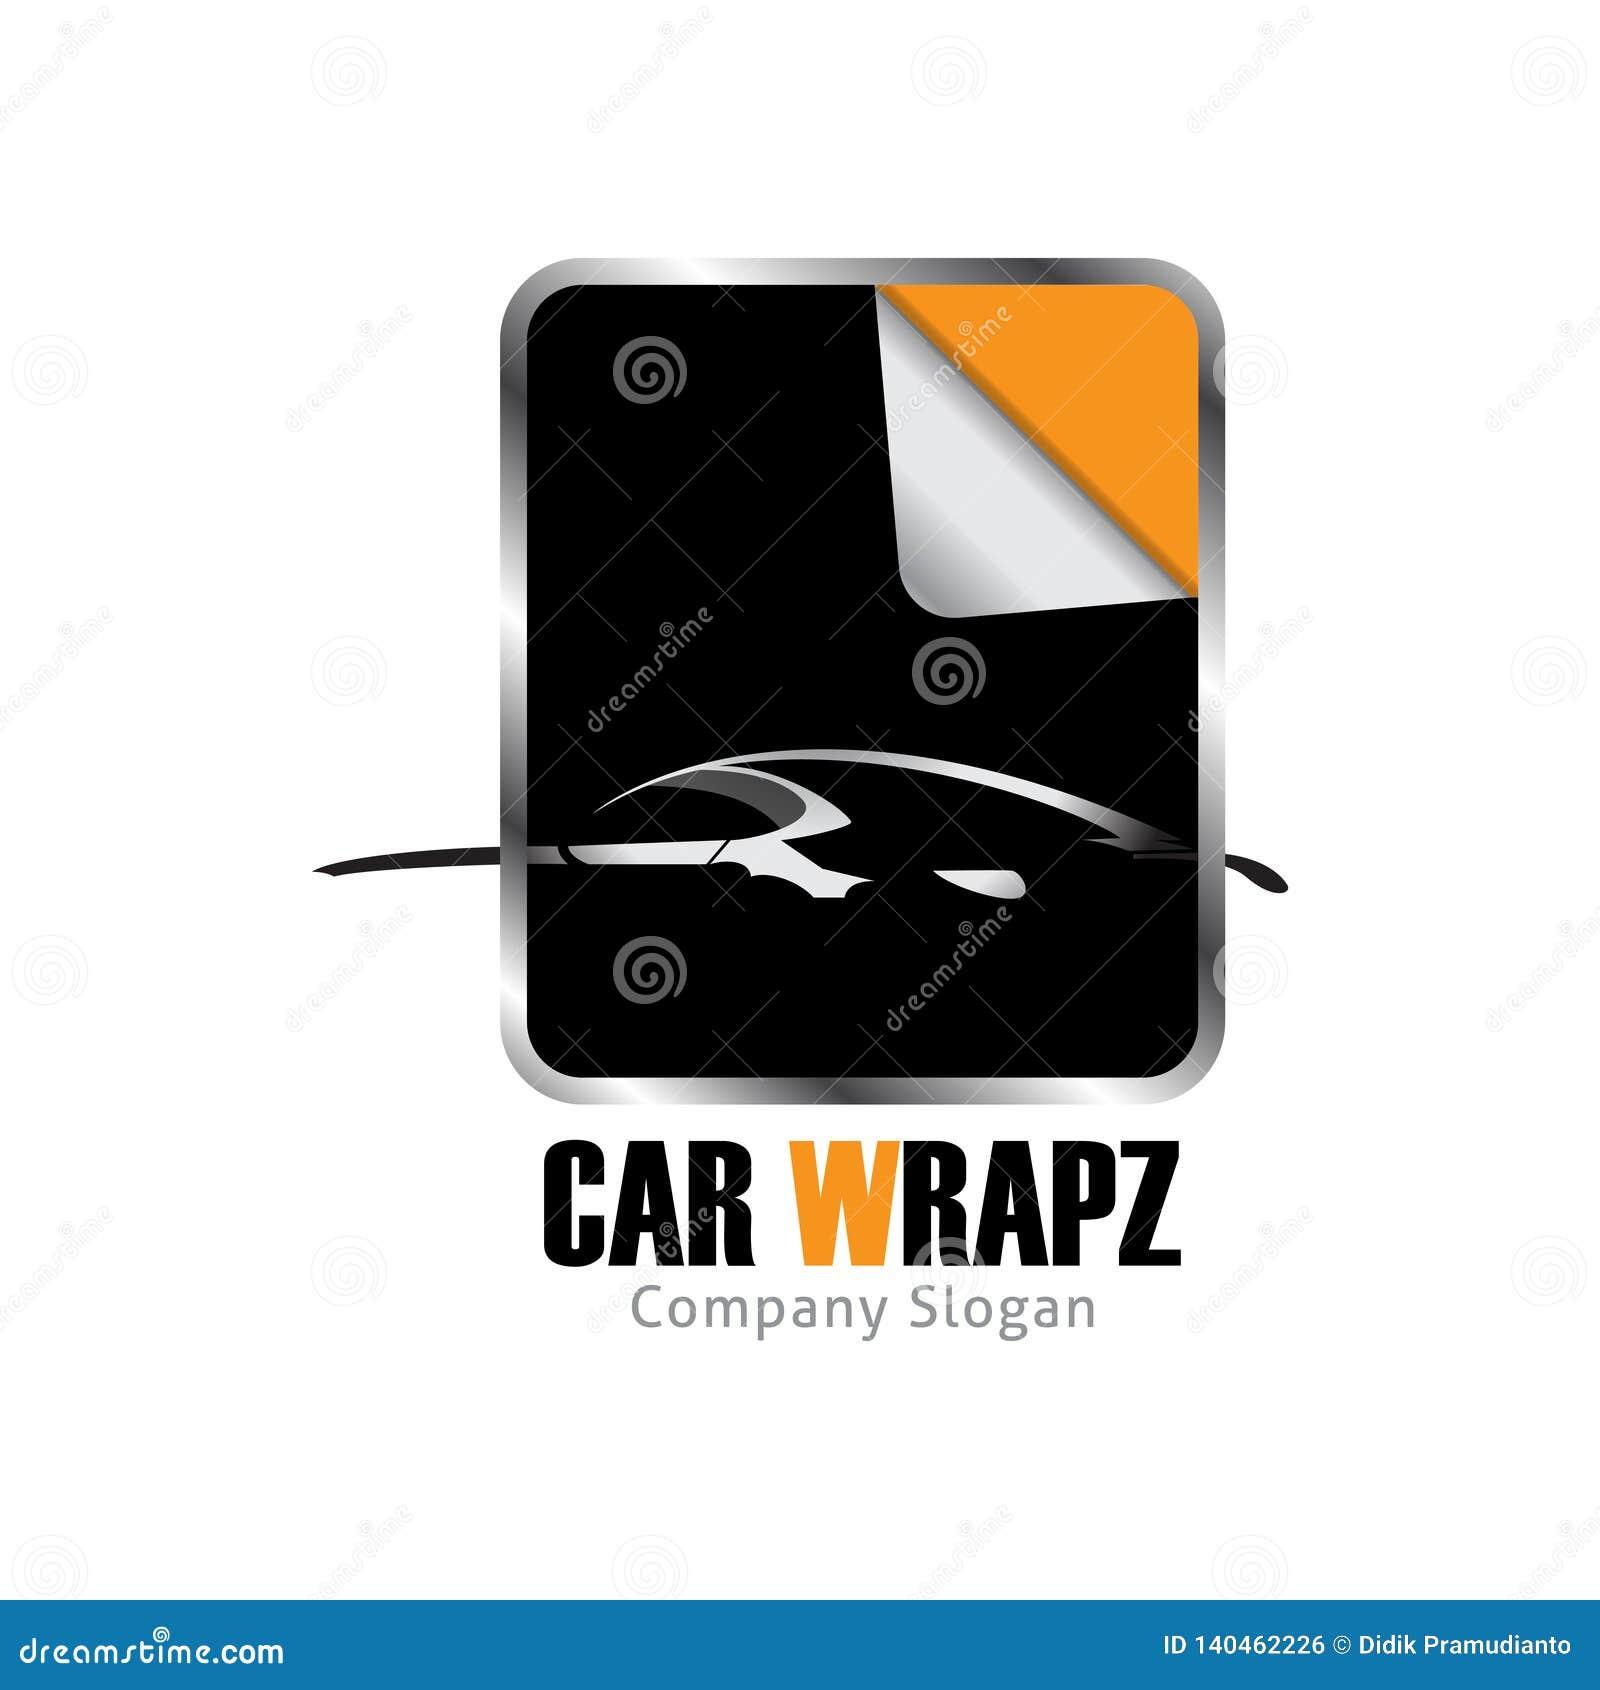 Car wrap logo design for beautiful car